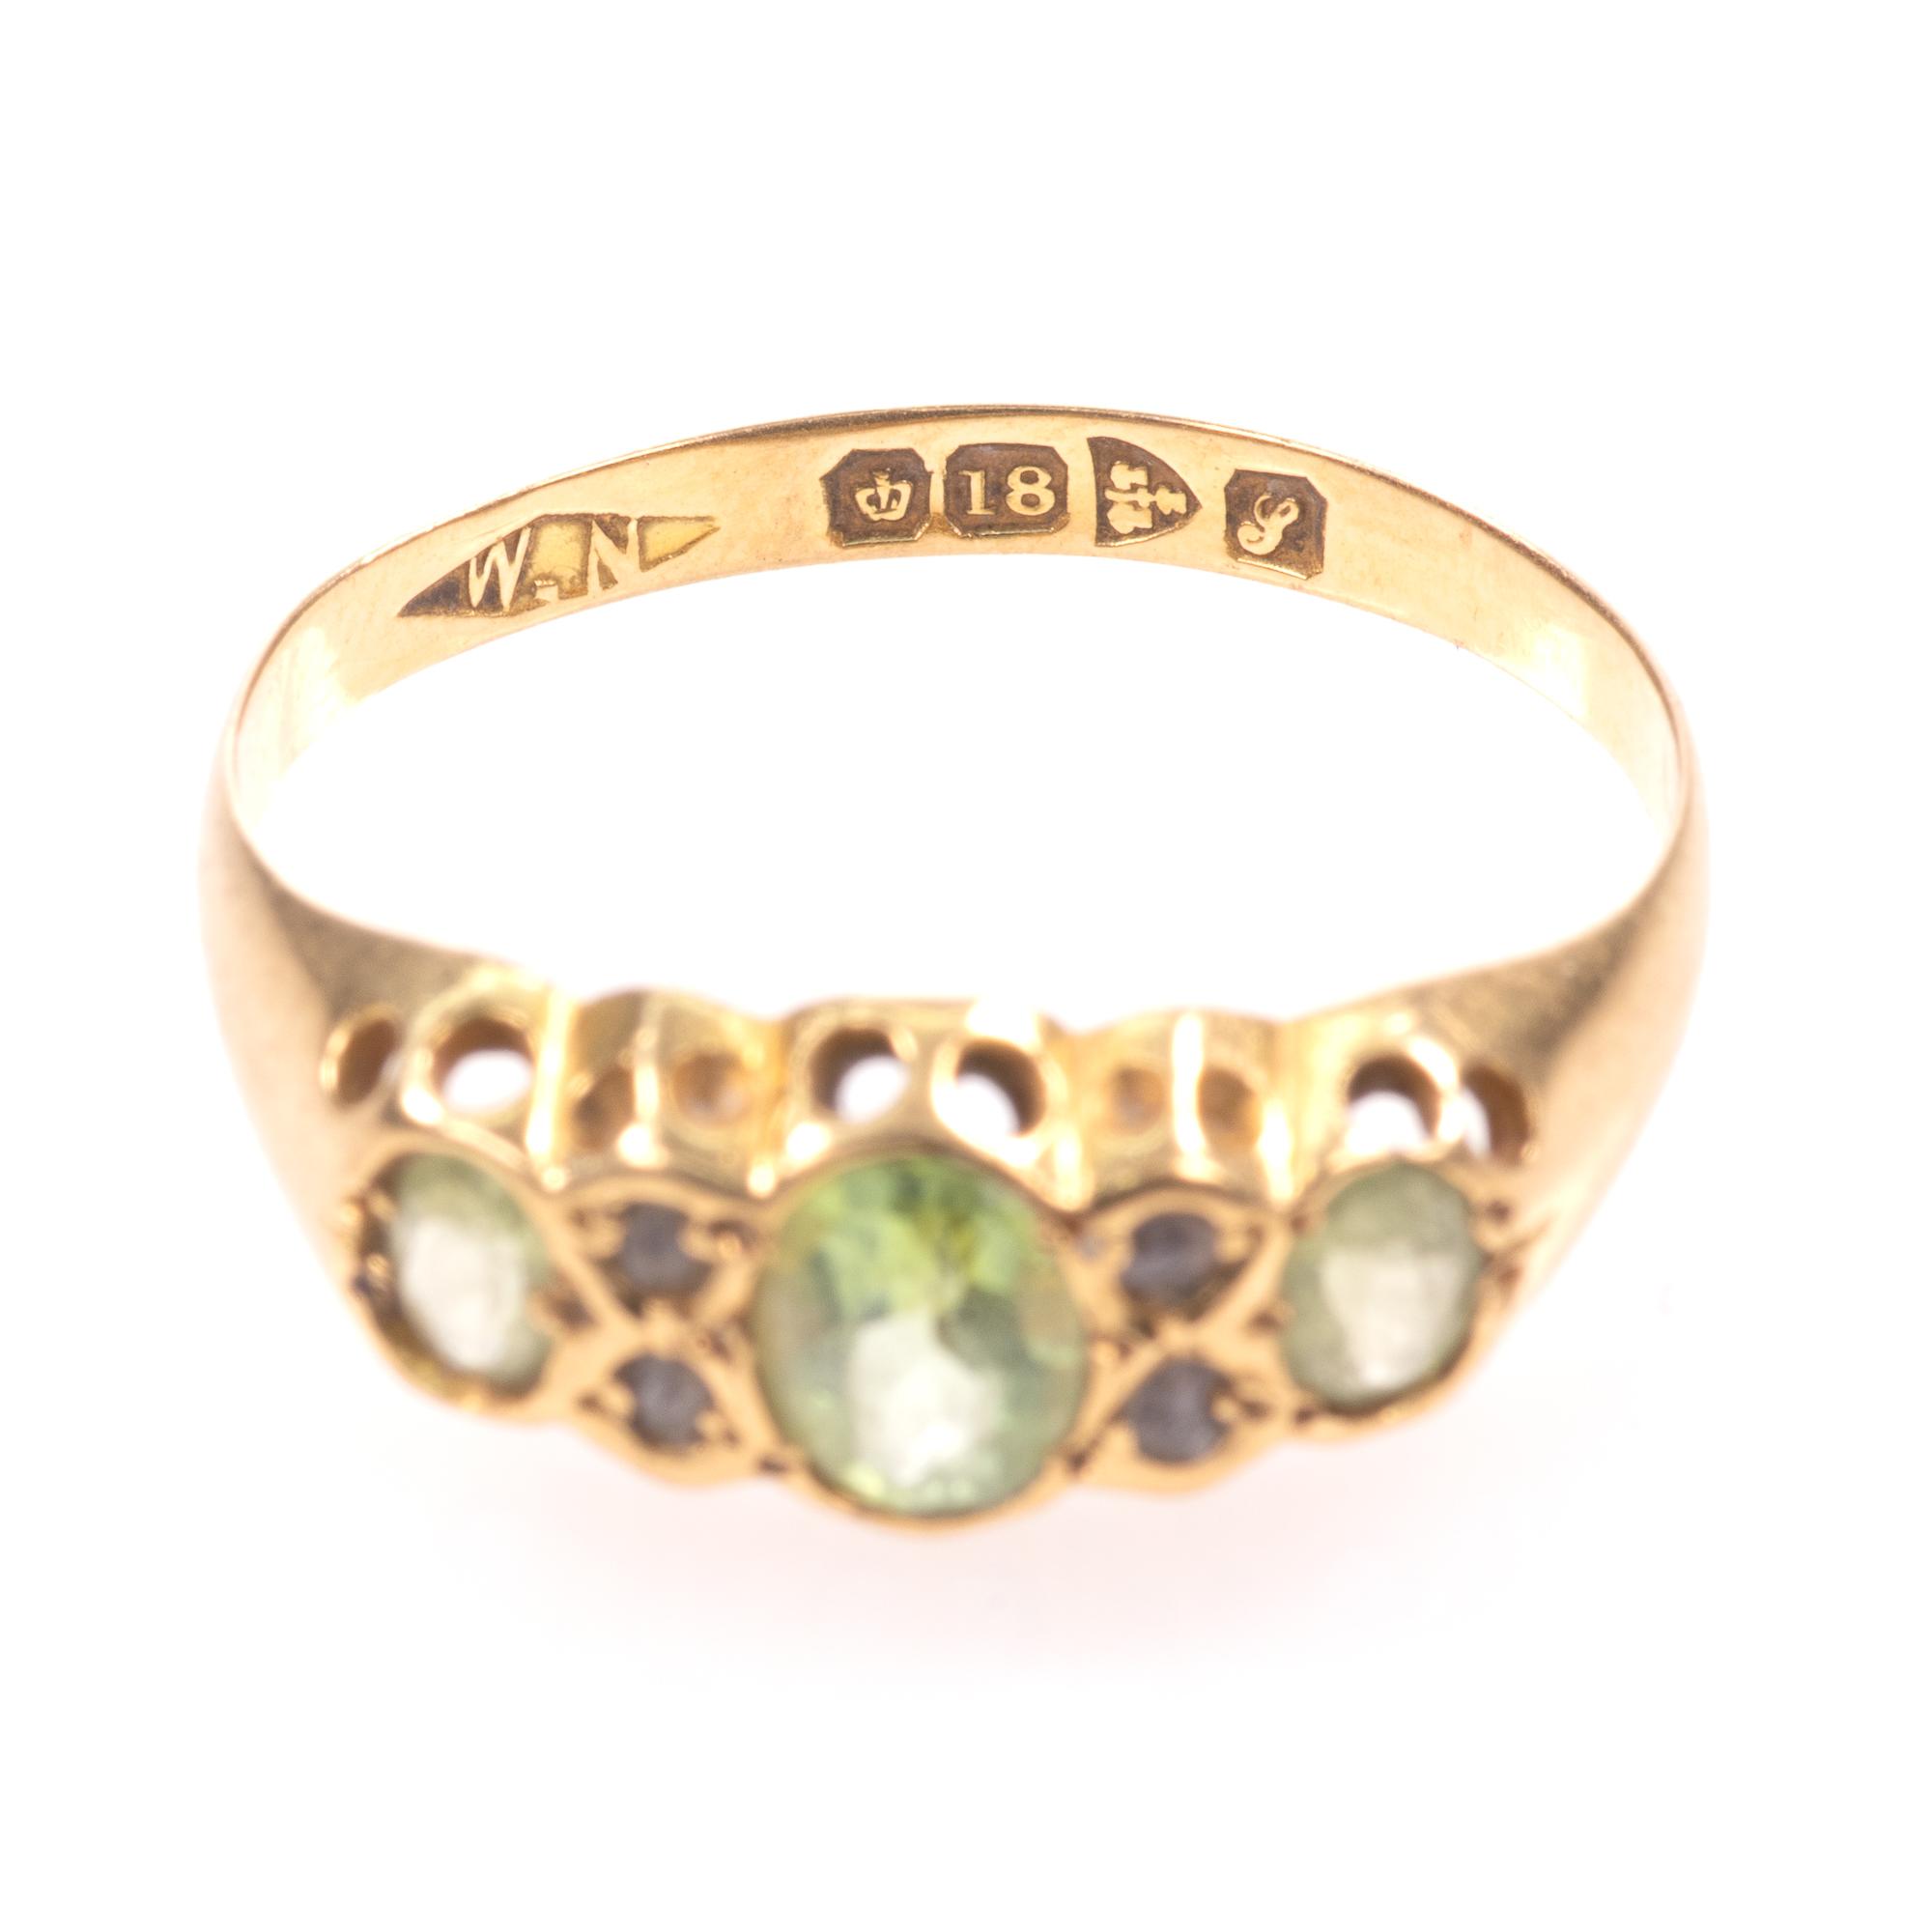 18ct Gold 0.90ct Peridot & Diamond Ring Chester 1918 - Image 4 of 8